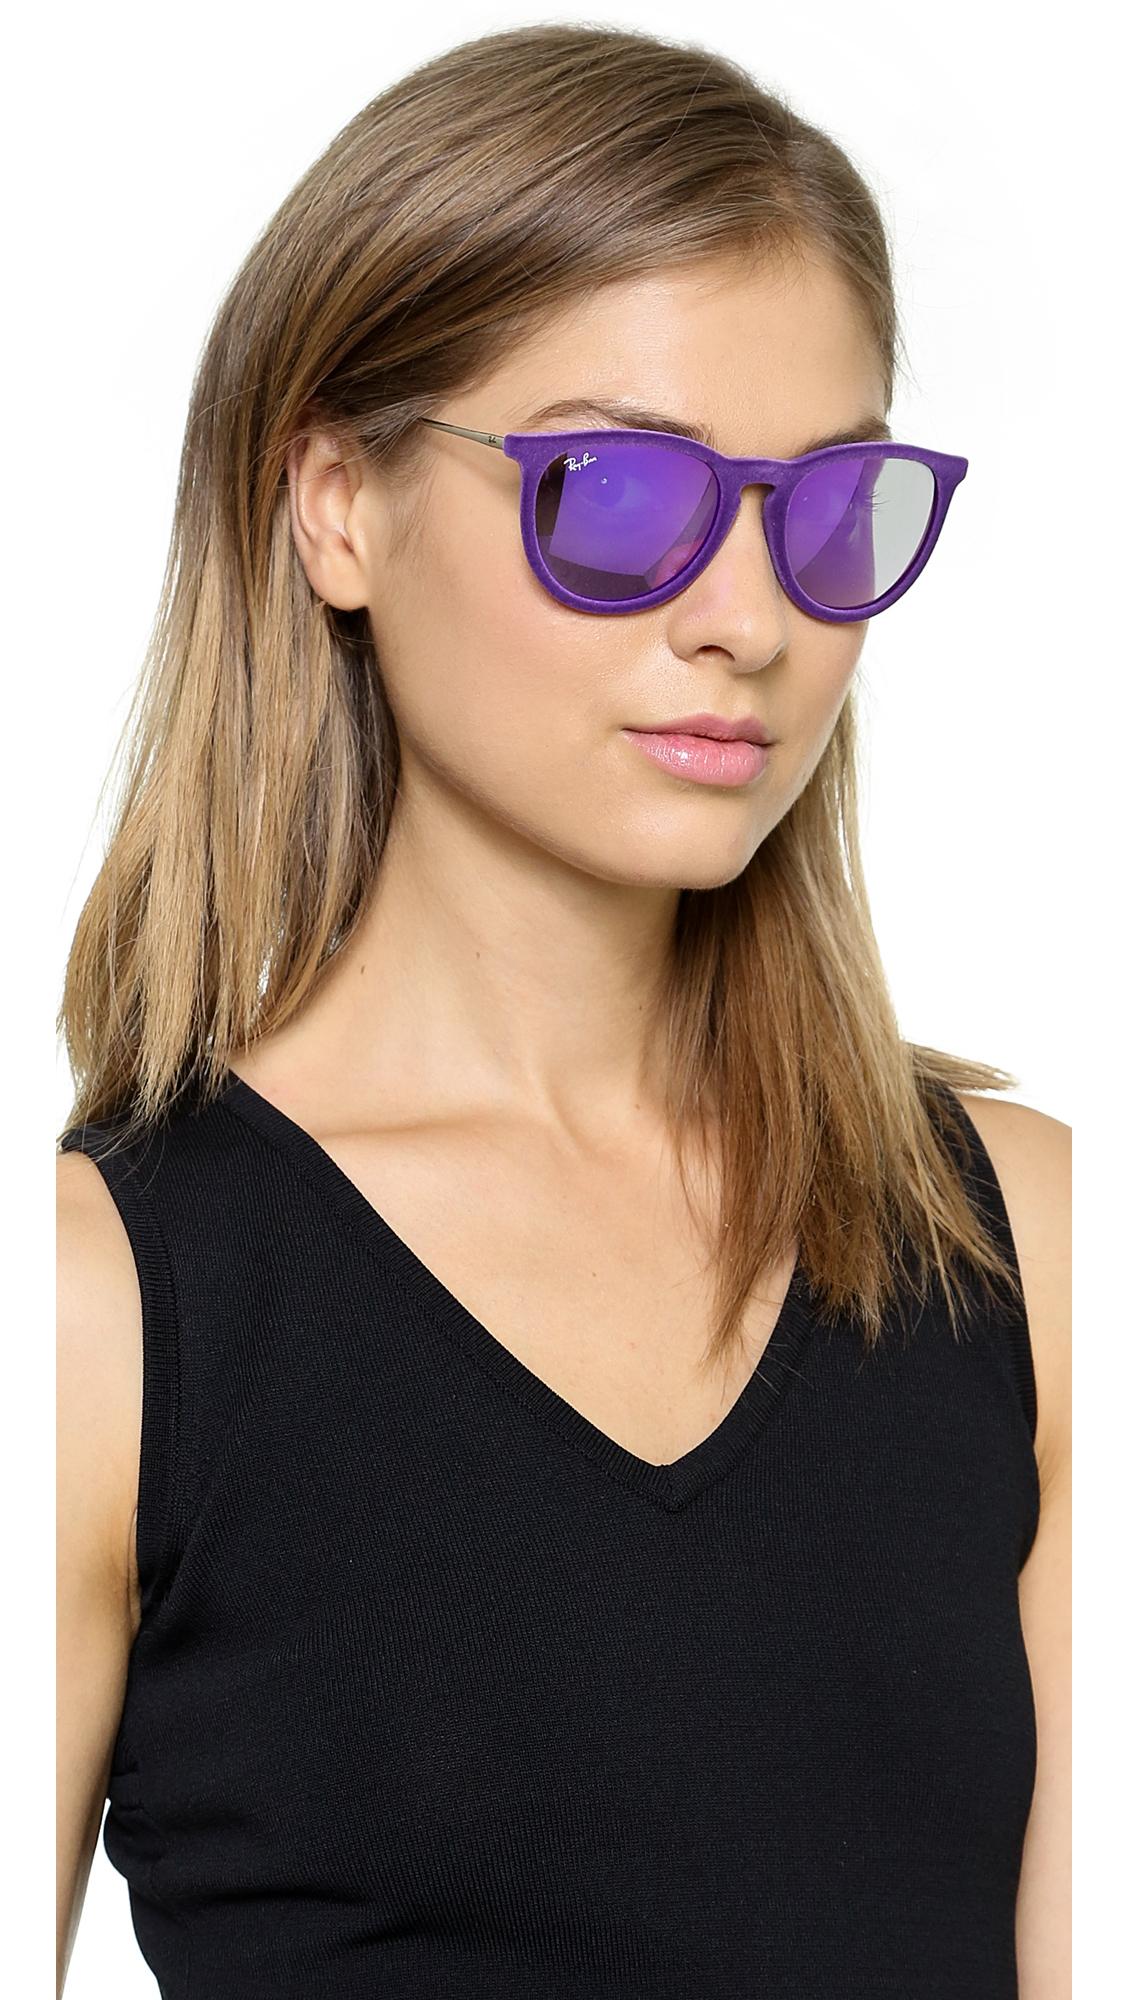 0d0ef53f7b Lyst - Ray-Ban Erika Velvet Sunglasses - Violet in Purple